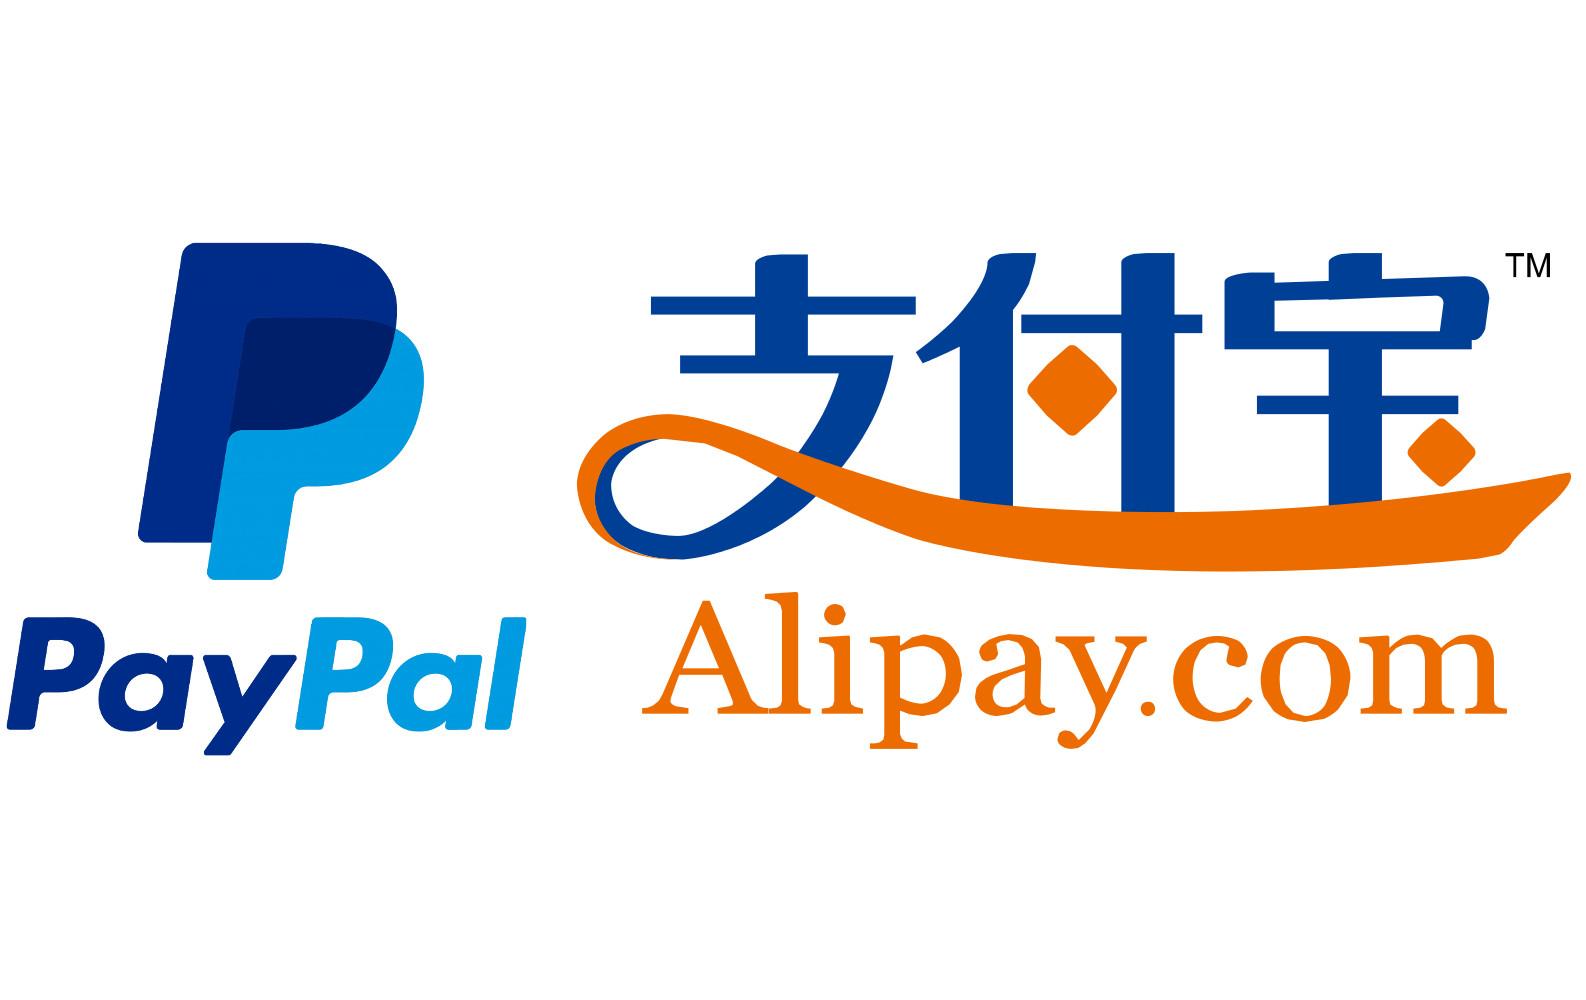 paypal alipay